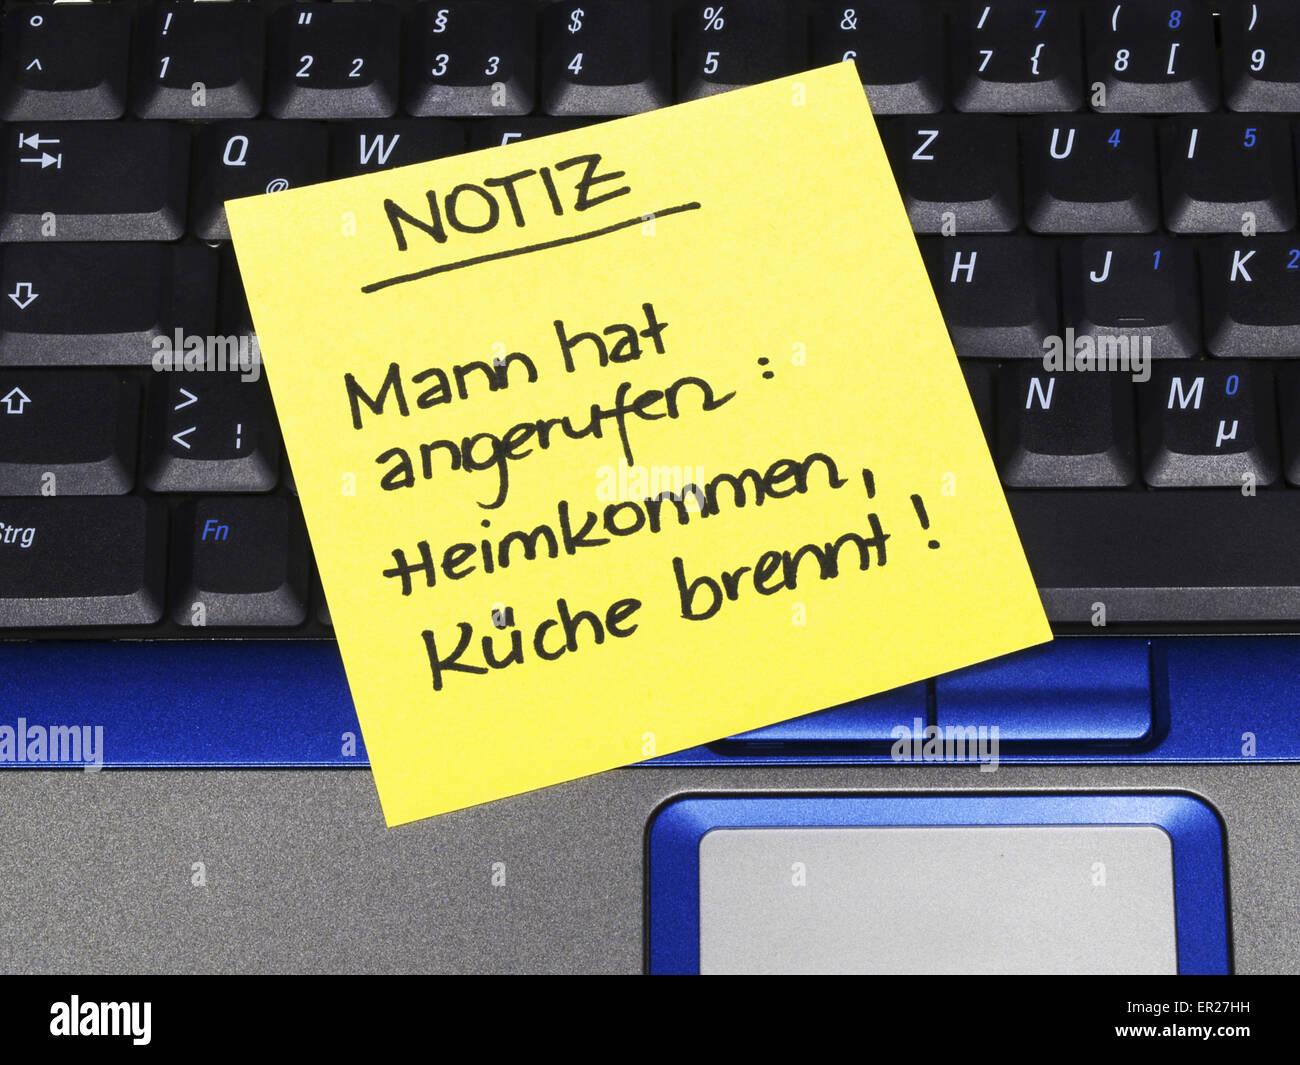 Paternity Leave Stockfotos & Paternity Leave Bilder - Alamy